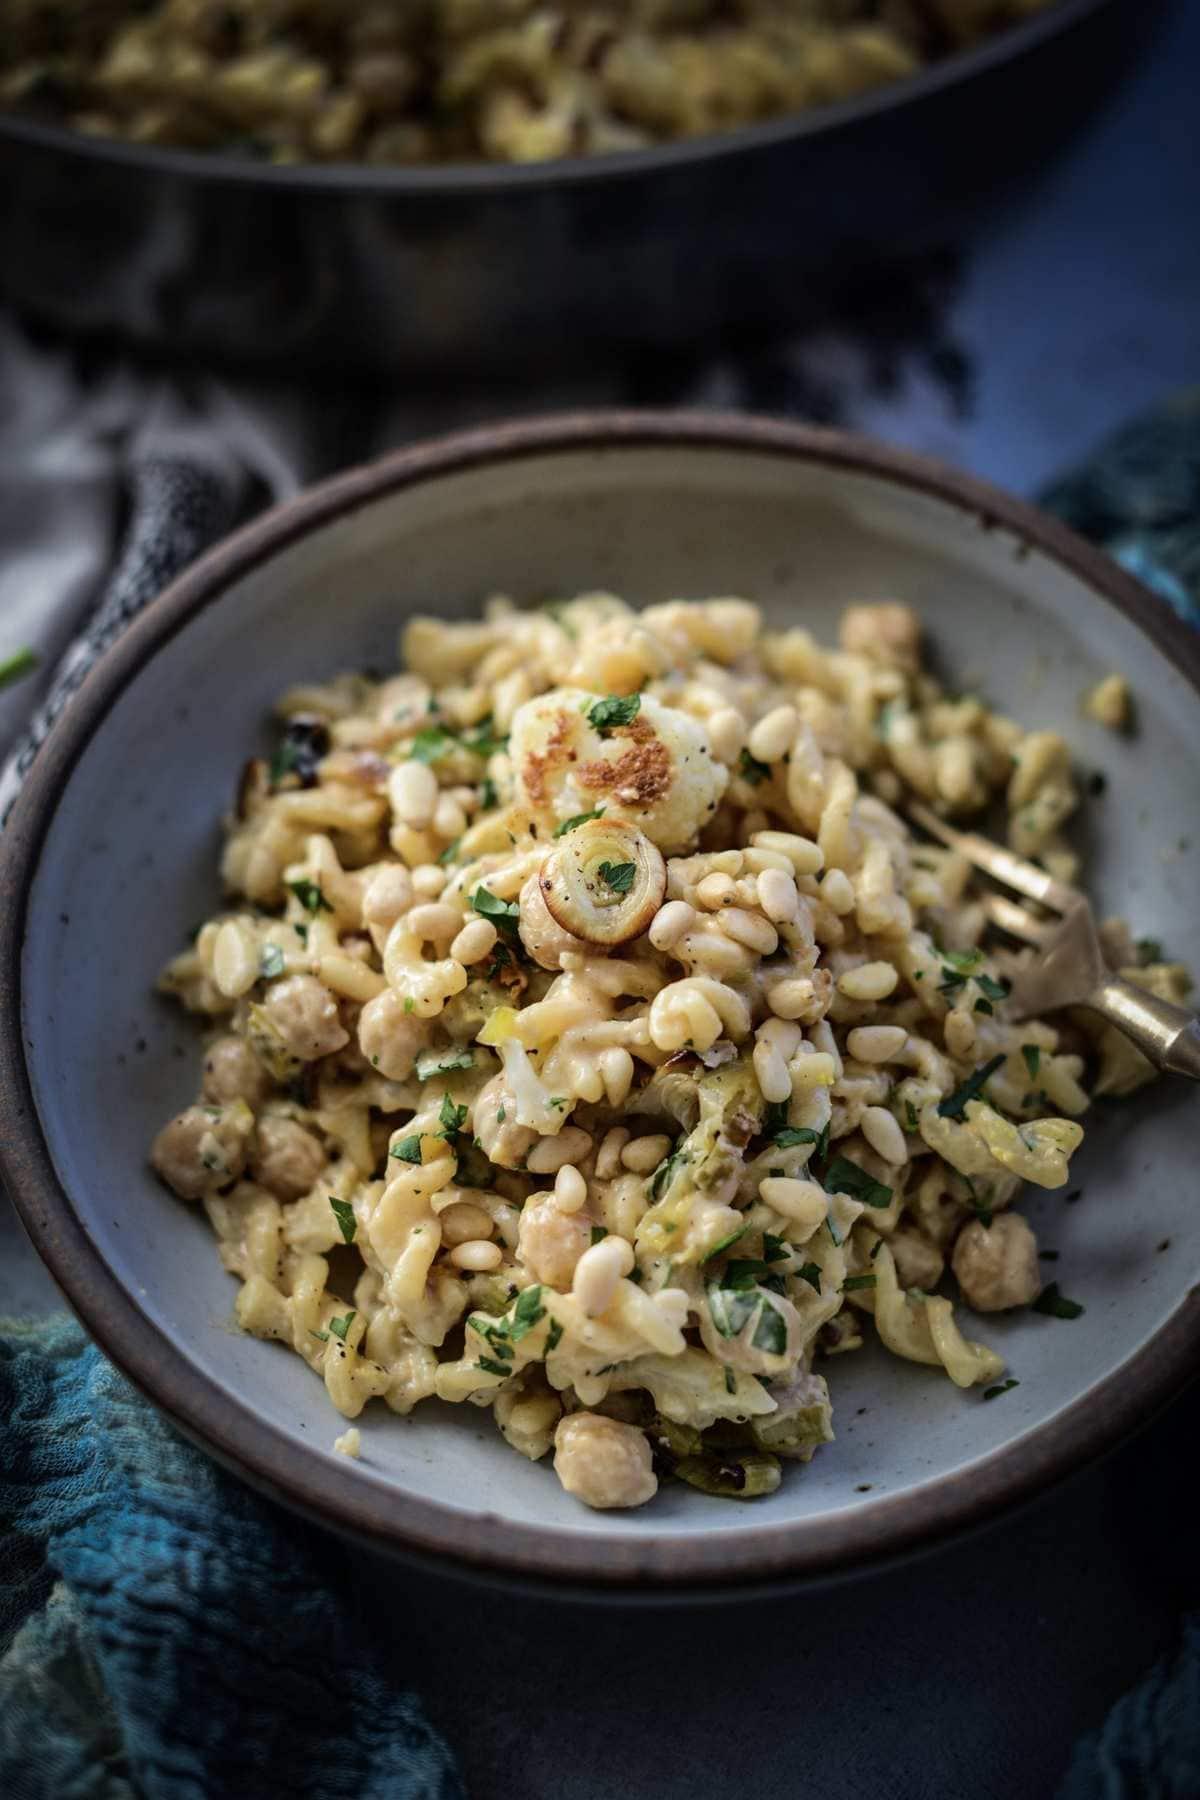 Creamy Roasted Cauliflower Leek & Chickpea Pasta – Vegan, GF friendly